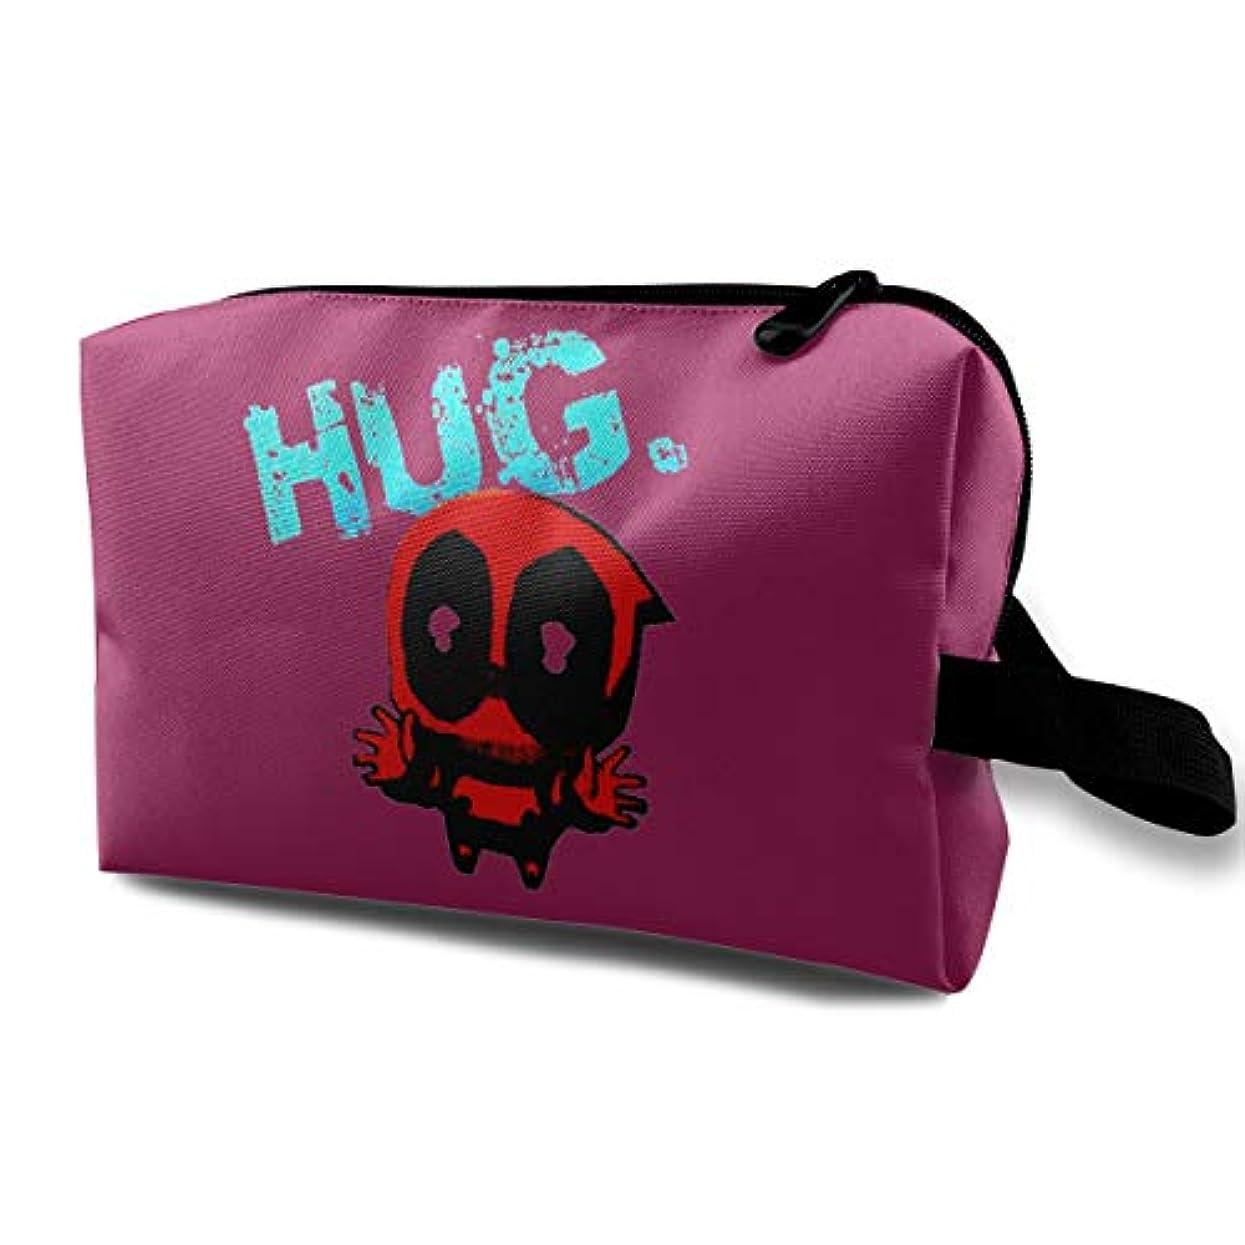 HUG 可愛いメンズ 化粧ポーチ 携帯用 化粧ポーチ 大容量 軽い 旅行ポーチ 洗面用具入れ 化粧ポーチ 収納 ハンドバッグ 財布 防水